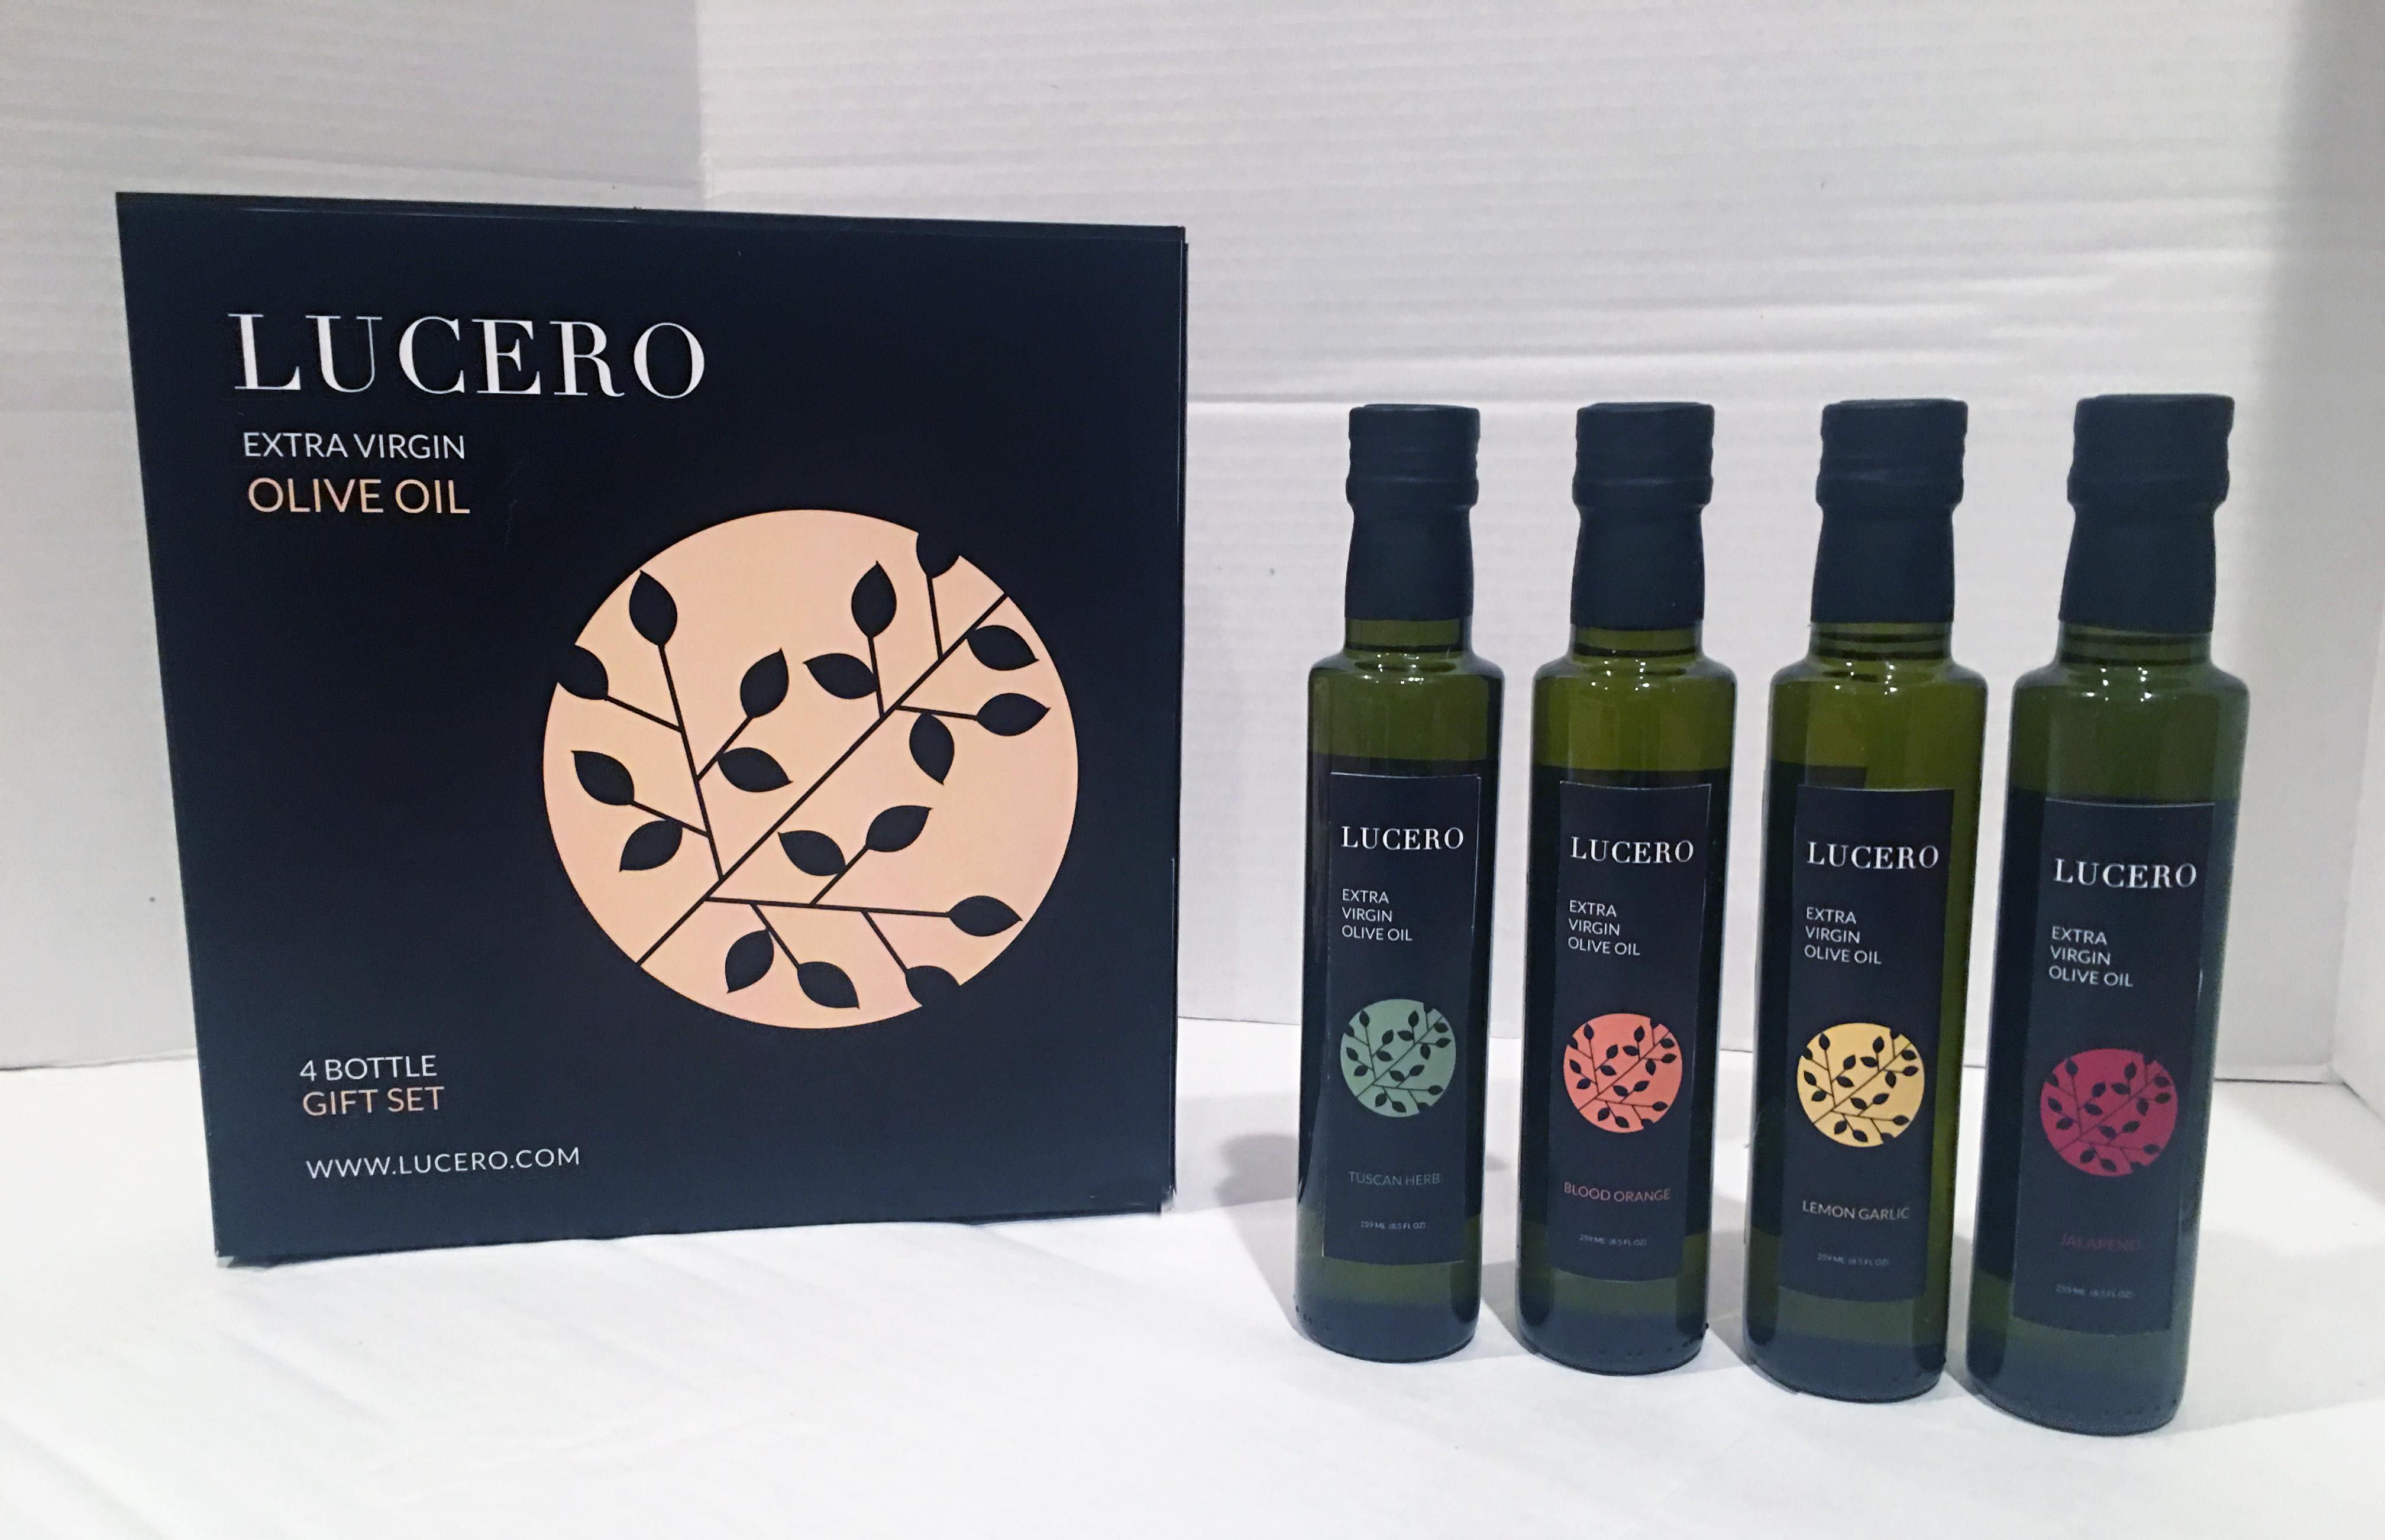 Lucero Olive Oil